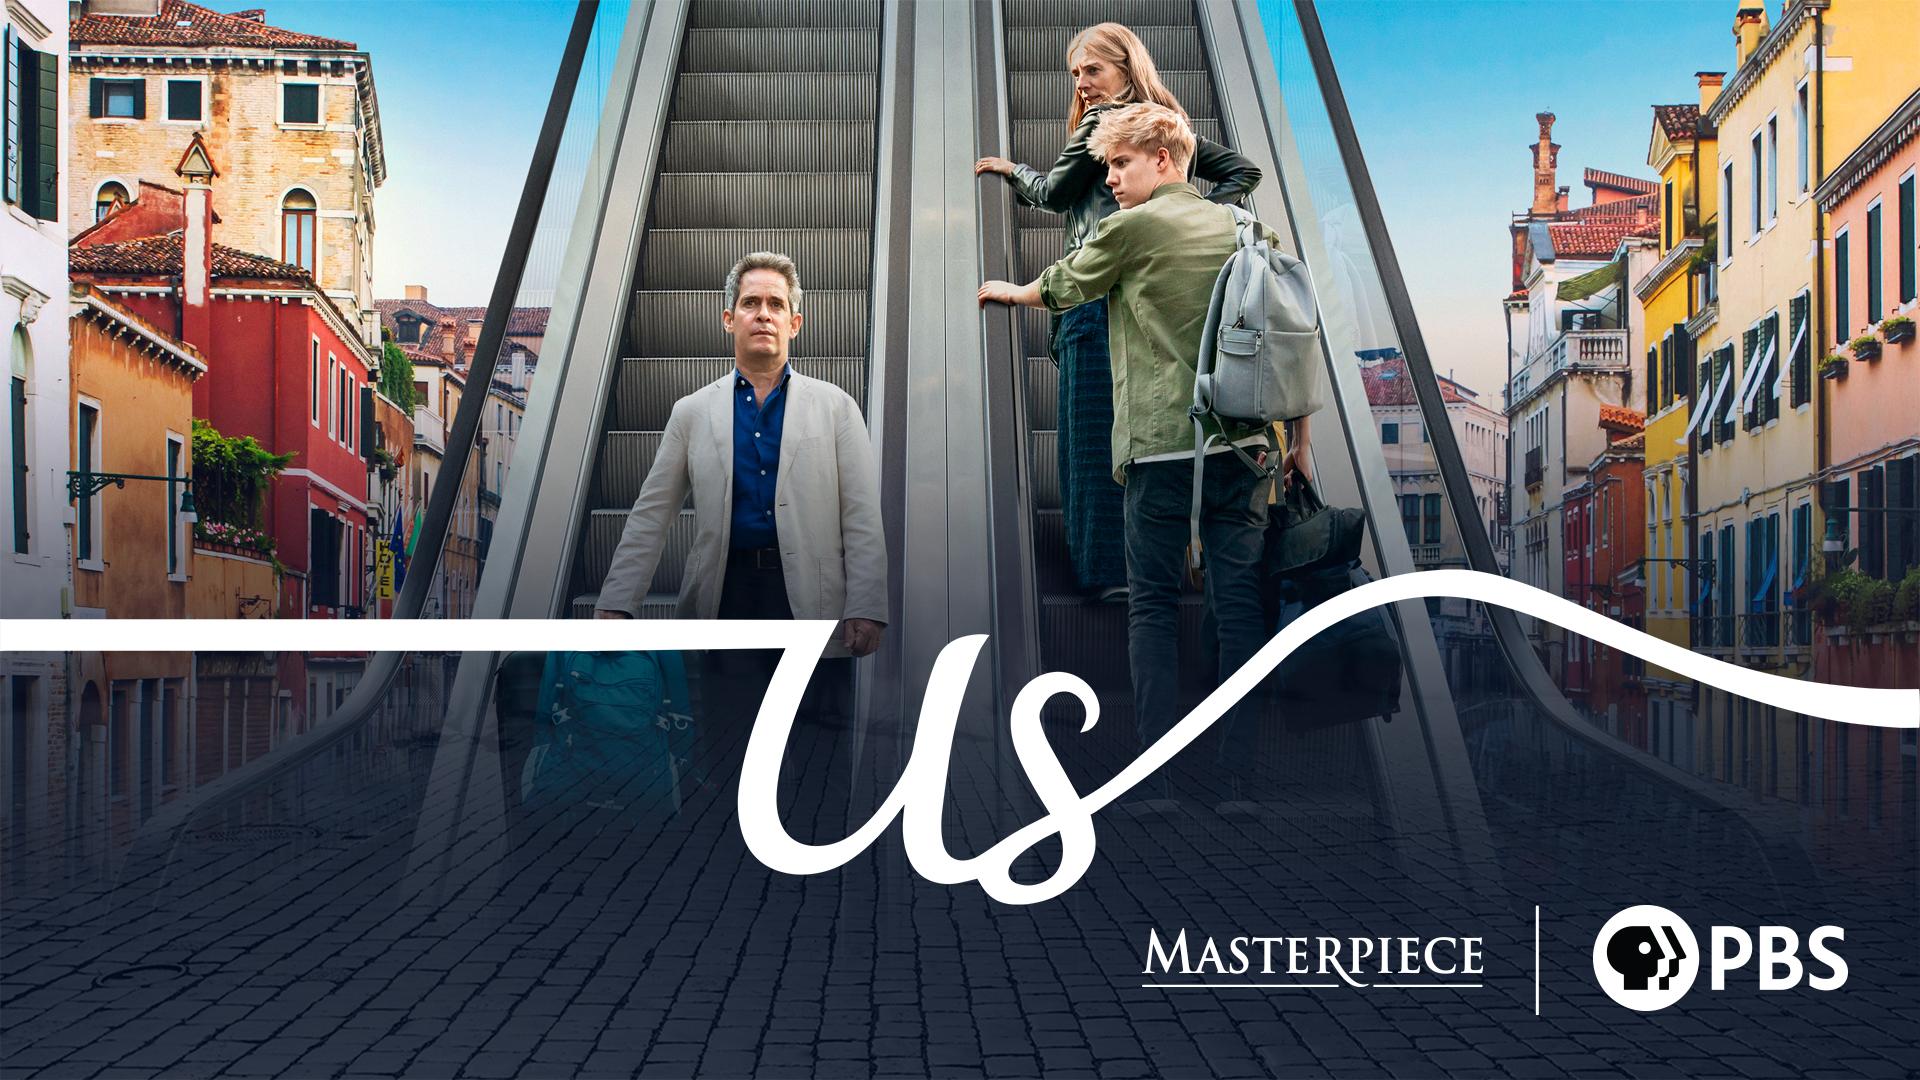 Us, Season 1